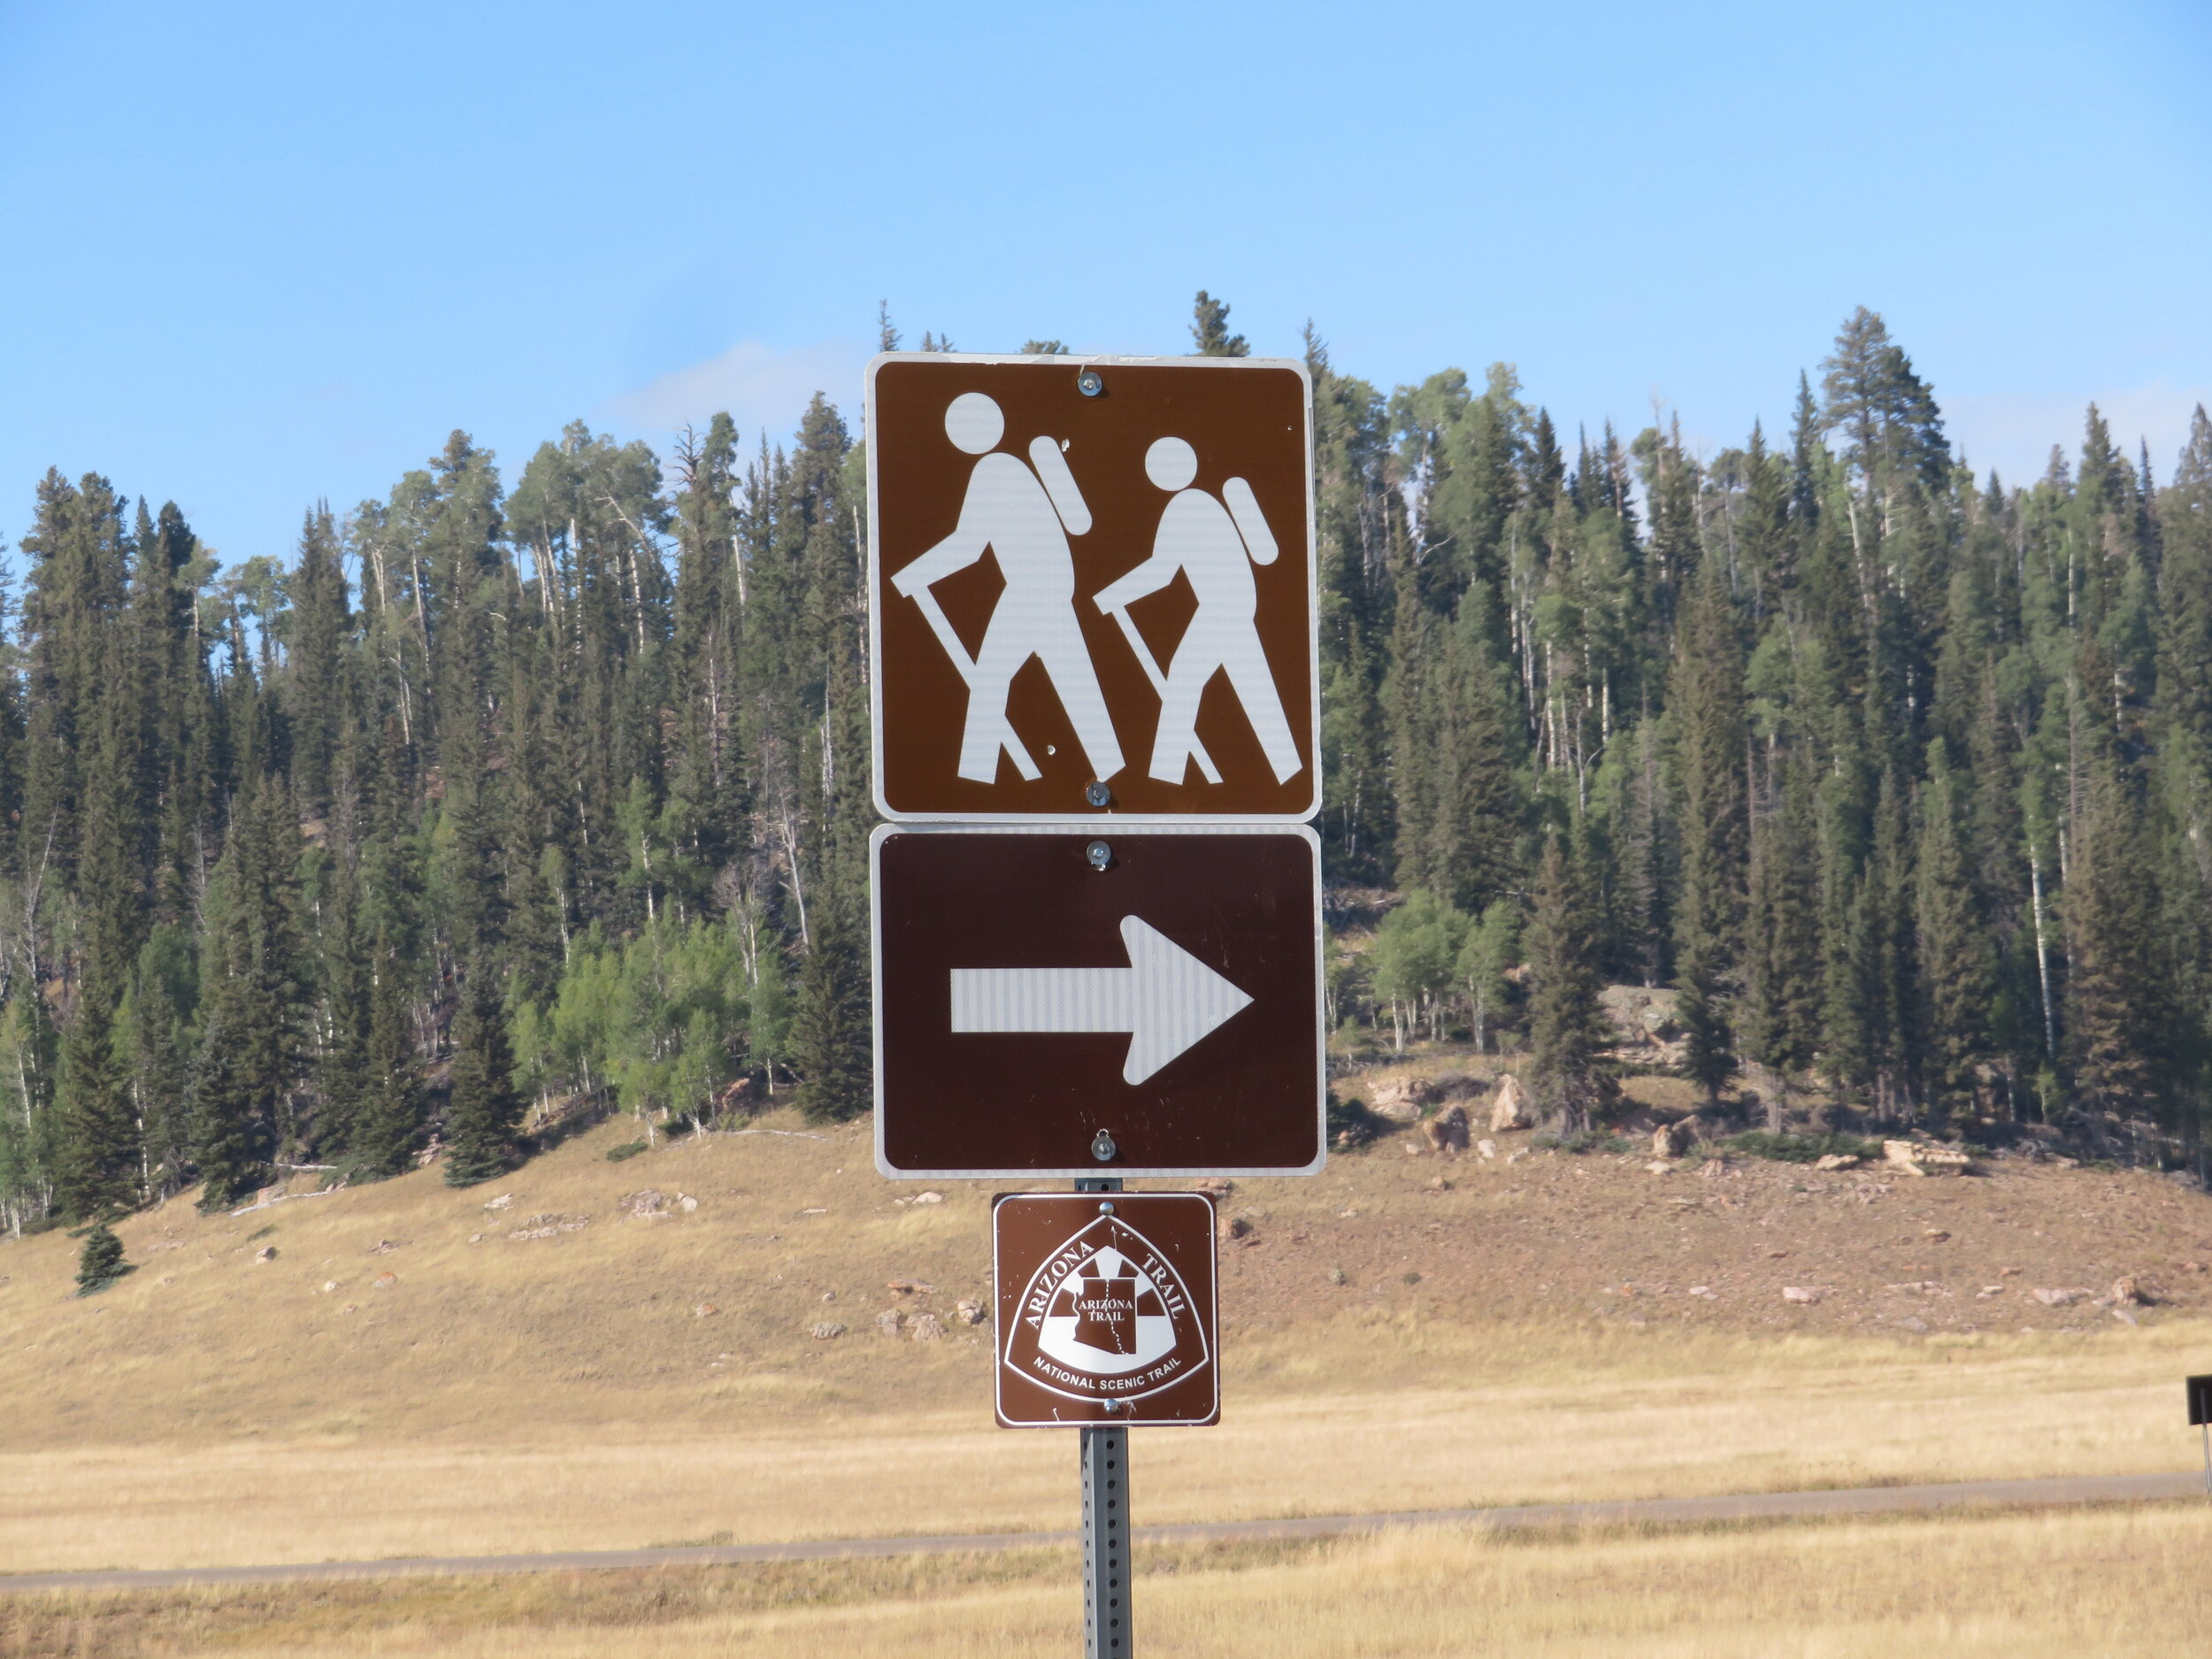 gcnp_AZT hiking sign.JPG